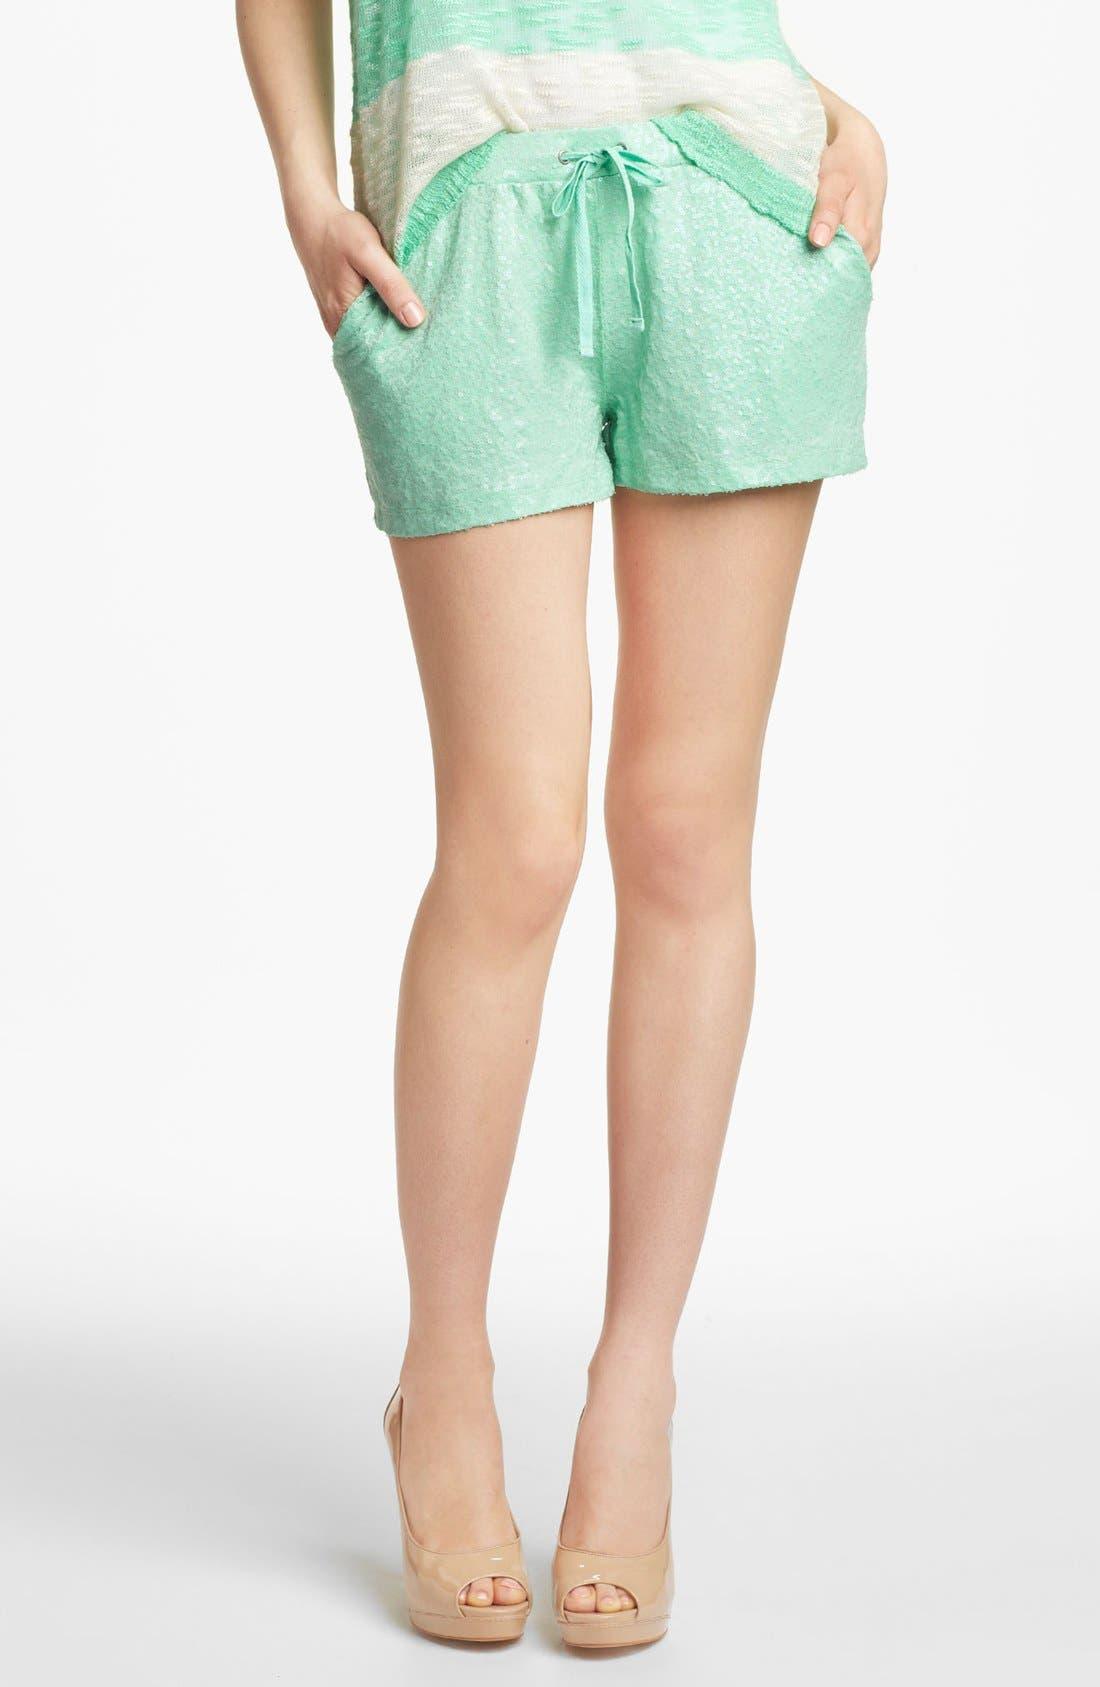 Alternate Image 1 Selected - Kensie Sequin Shorts